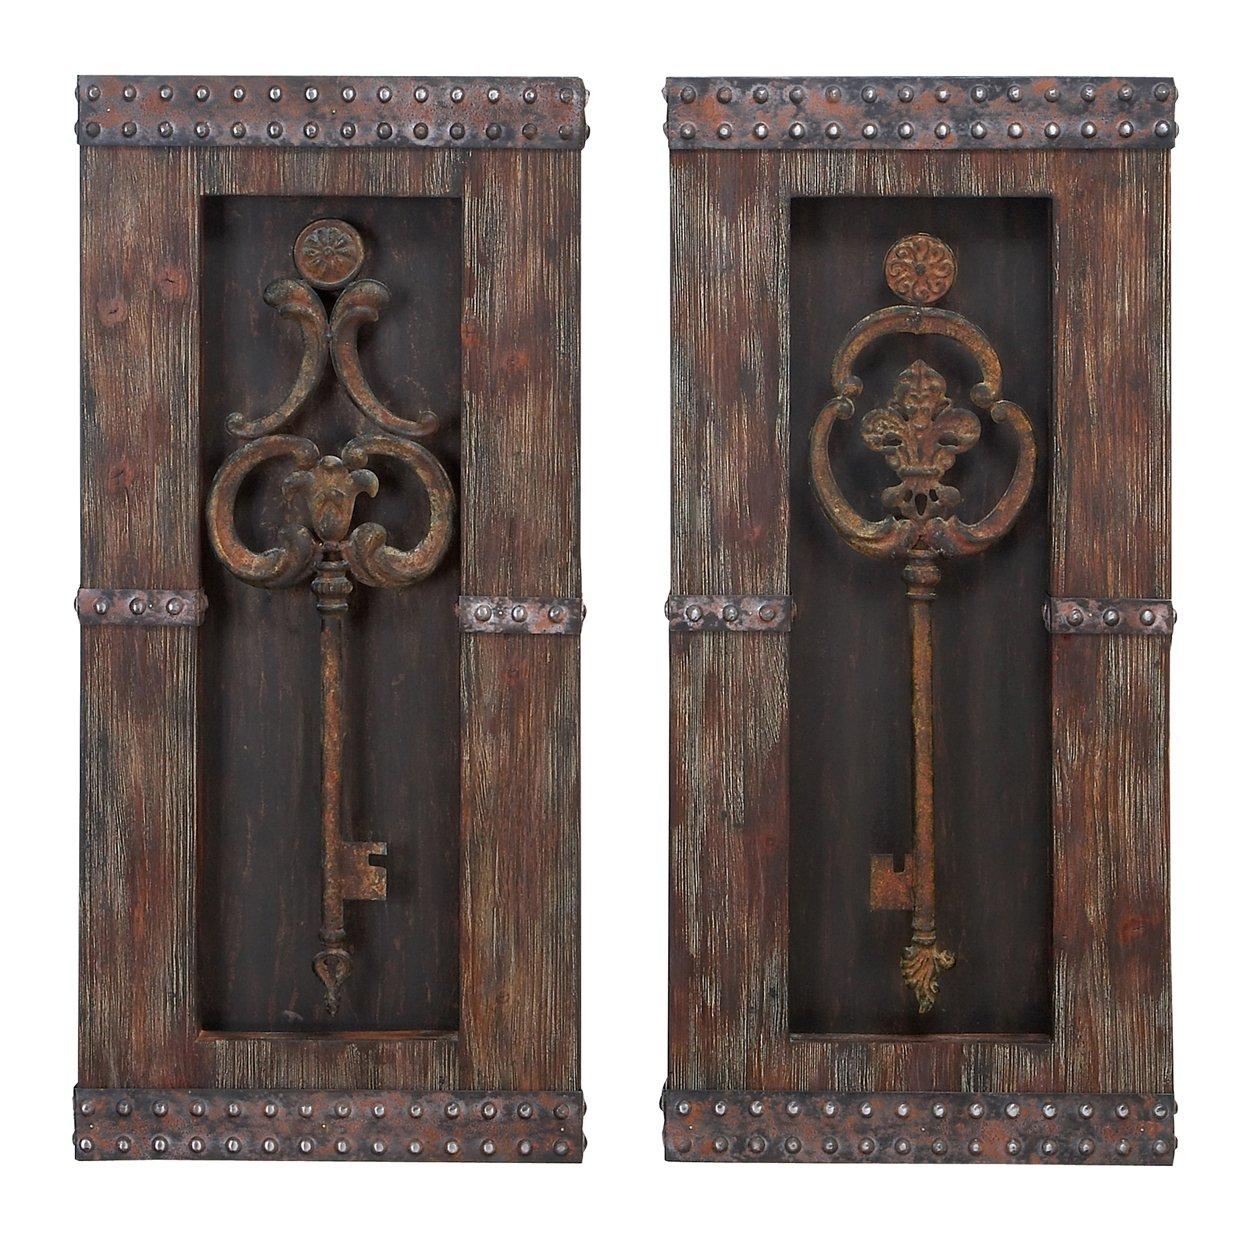 Urban Designs 2 Piece Vintage Metal Keys Wall Art Decor Set Brown 7720486